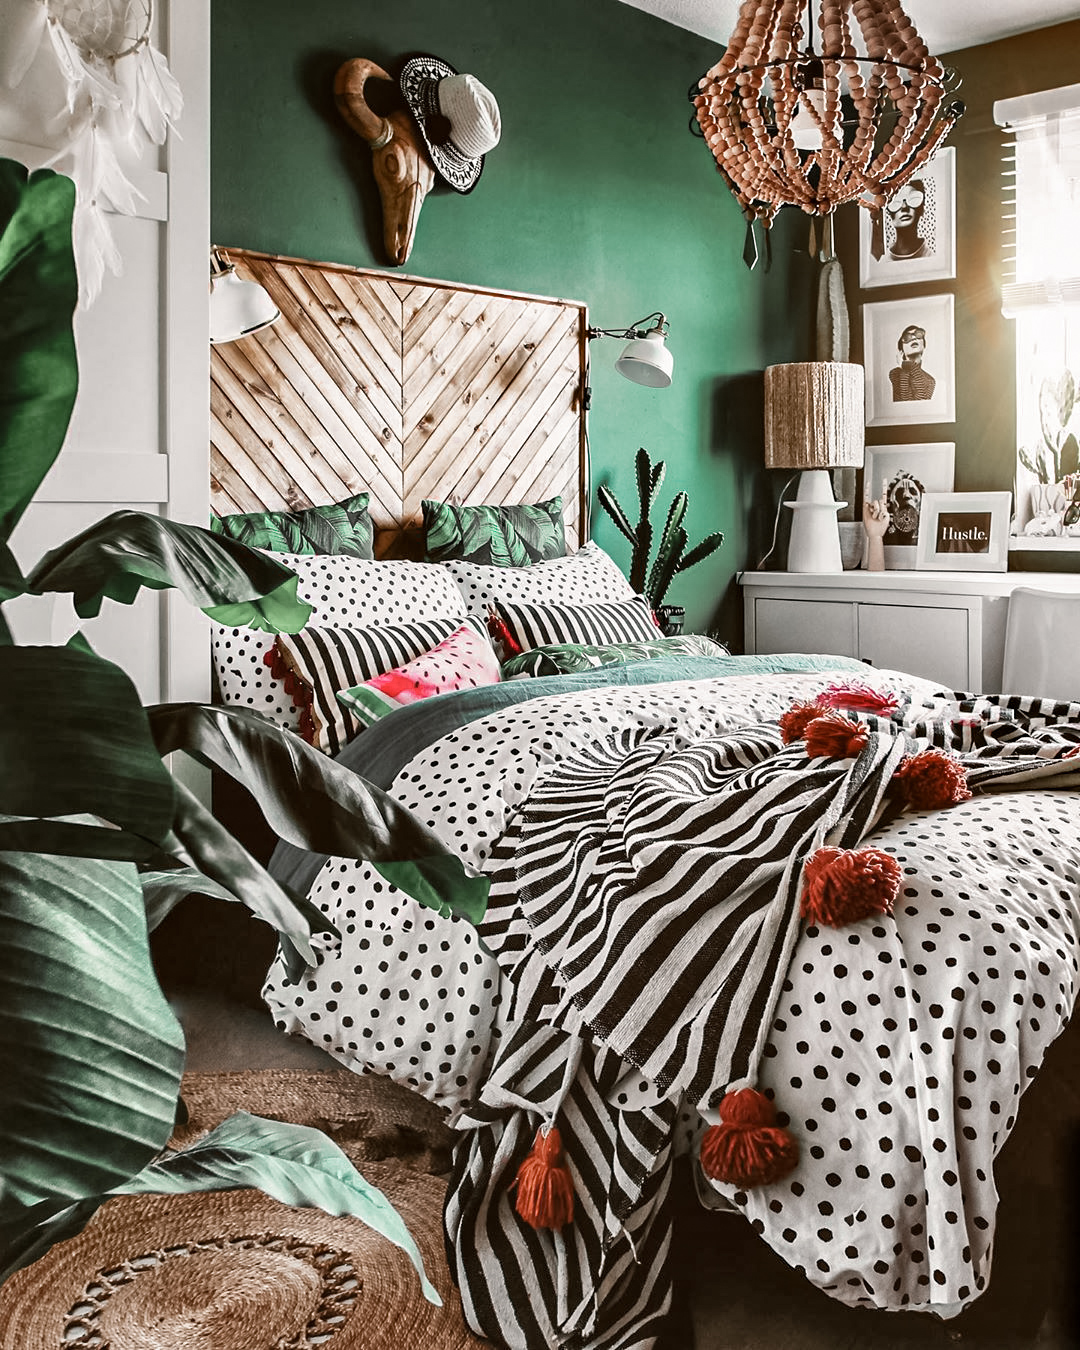 30-dreamy-green-bedrooms-ideas-2020